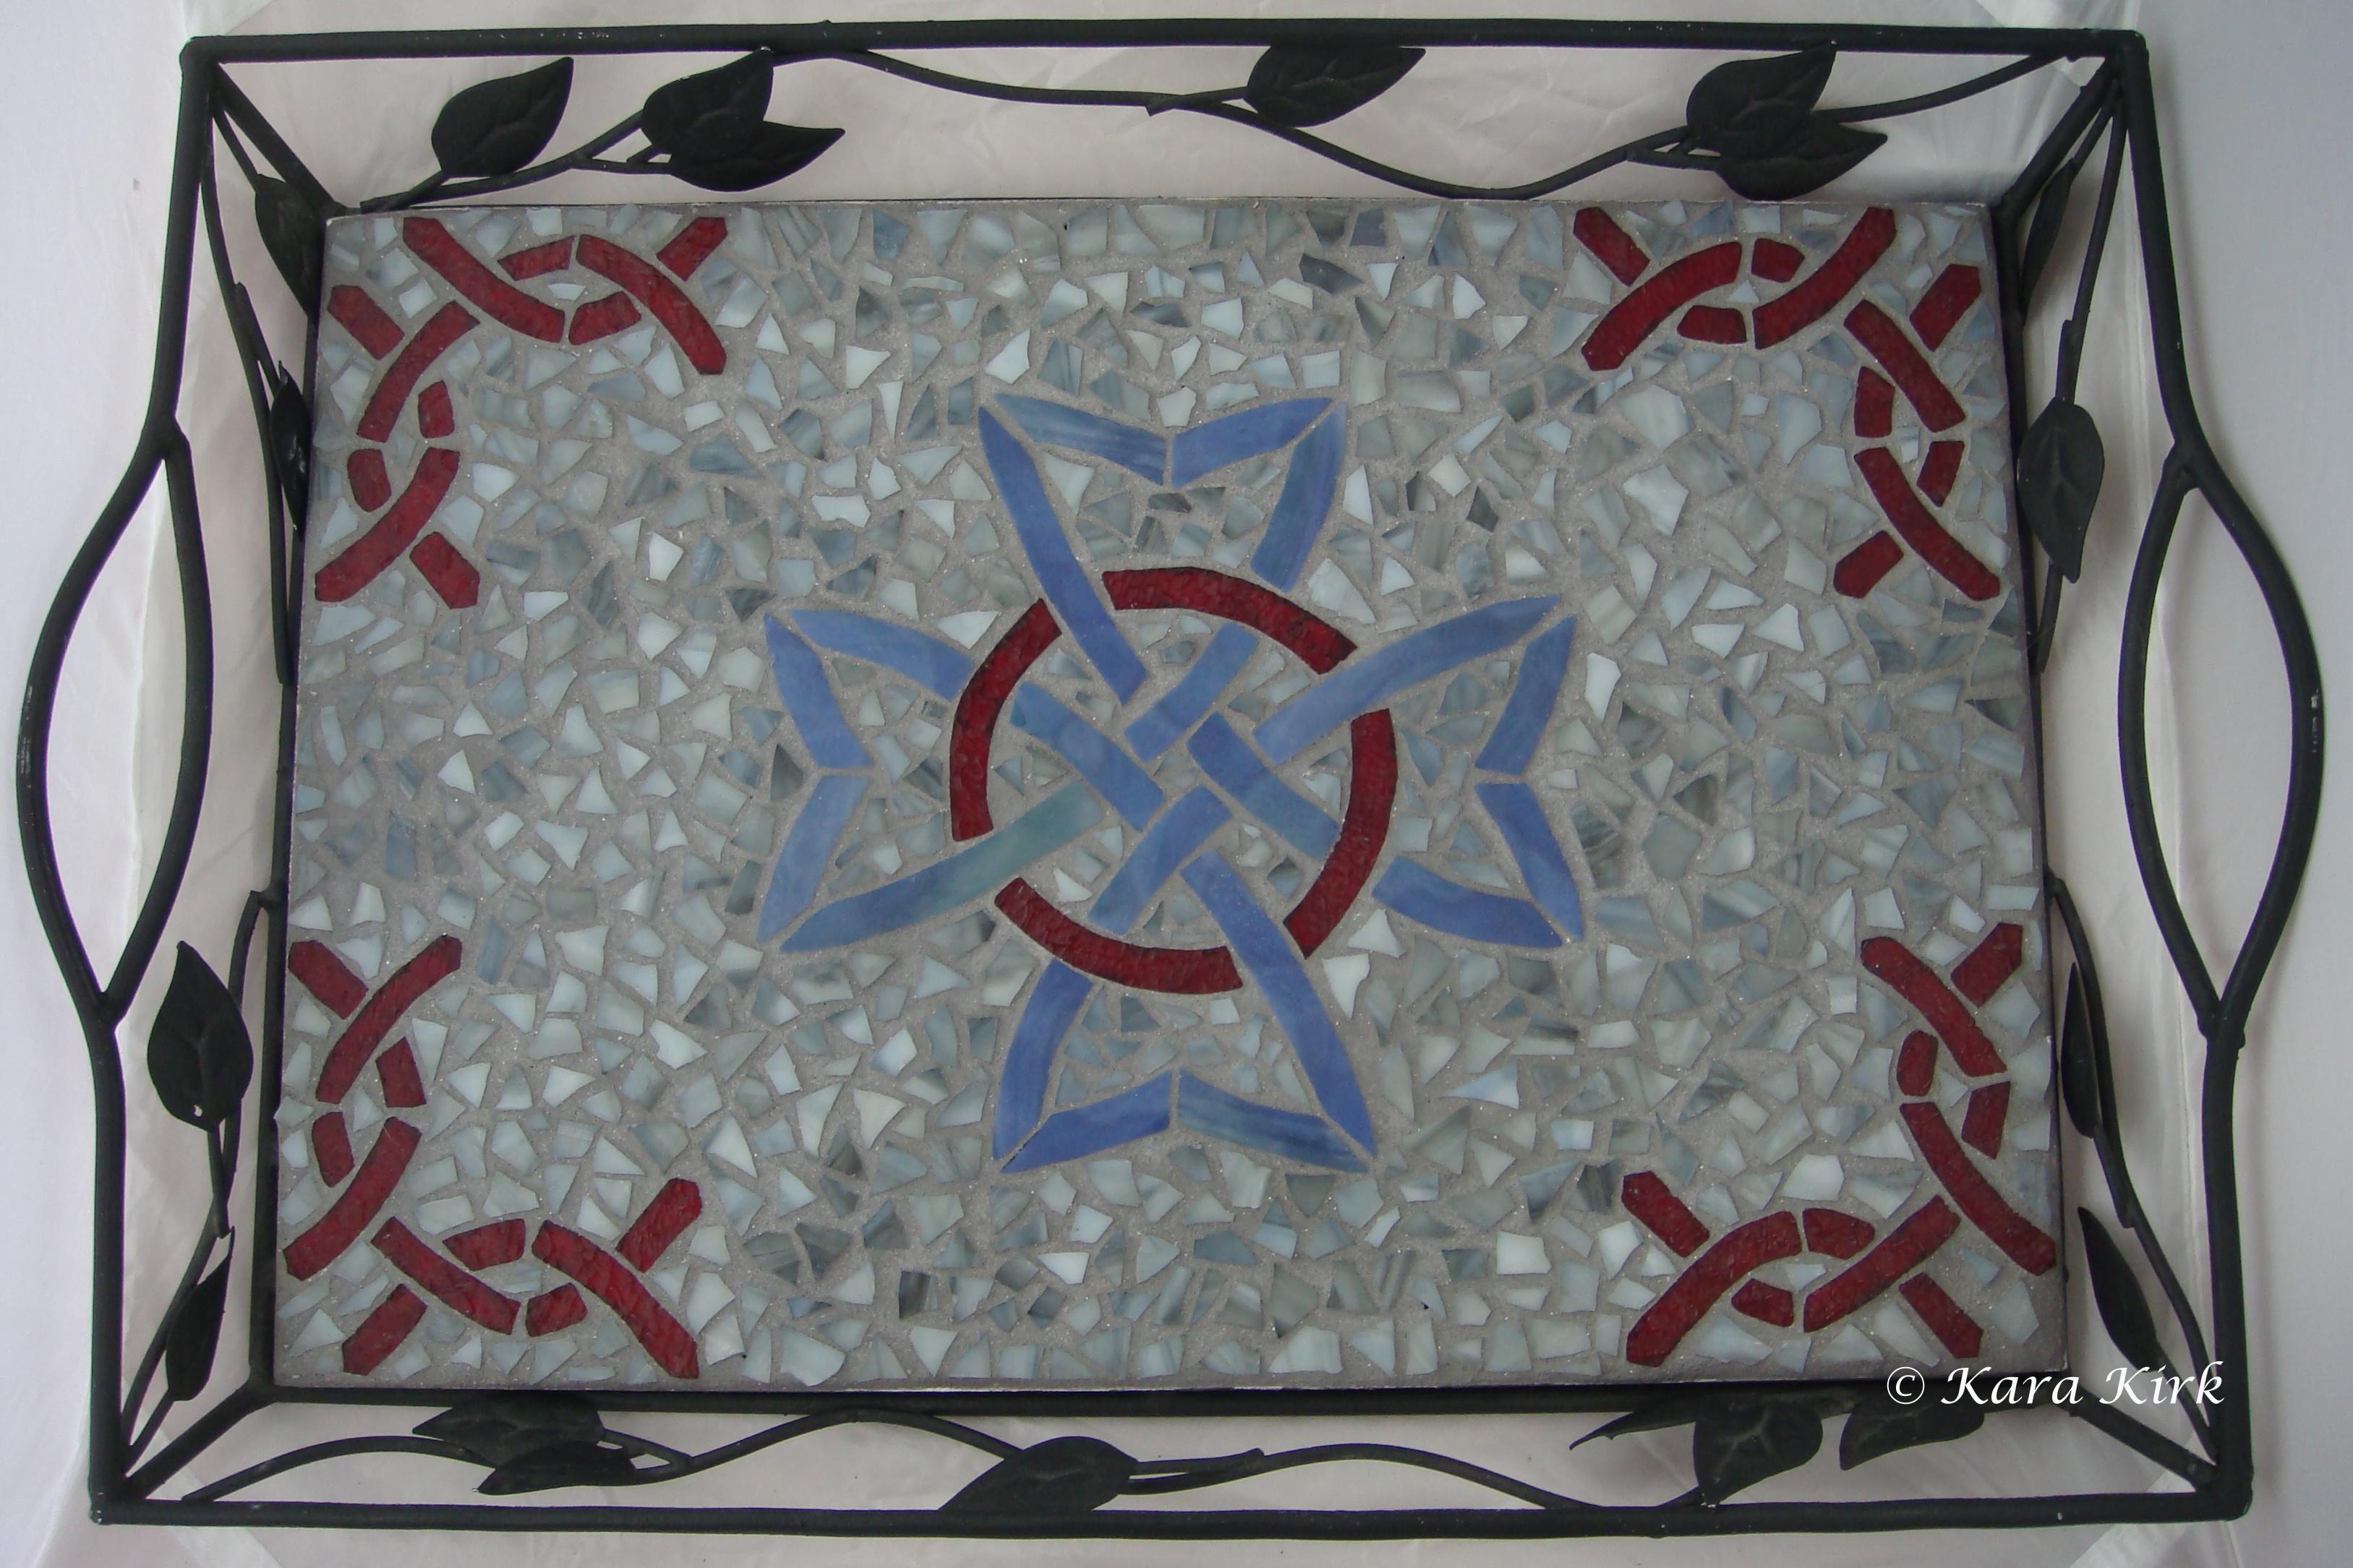 https://0201.nccdn.net/1_2/000/000/194/9e3/2002-Celtic-Mosaic-Metal-Tray-3-4x6-3254x2169.jpg